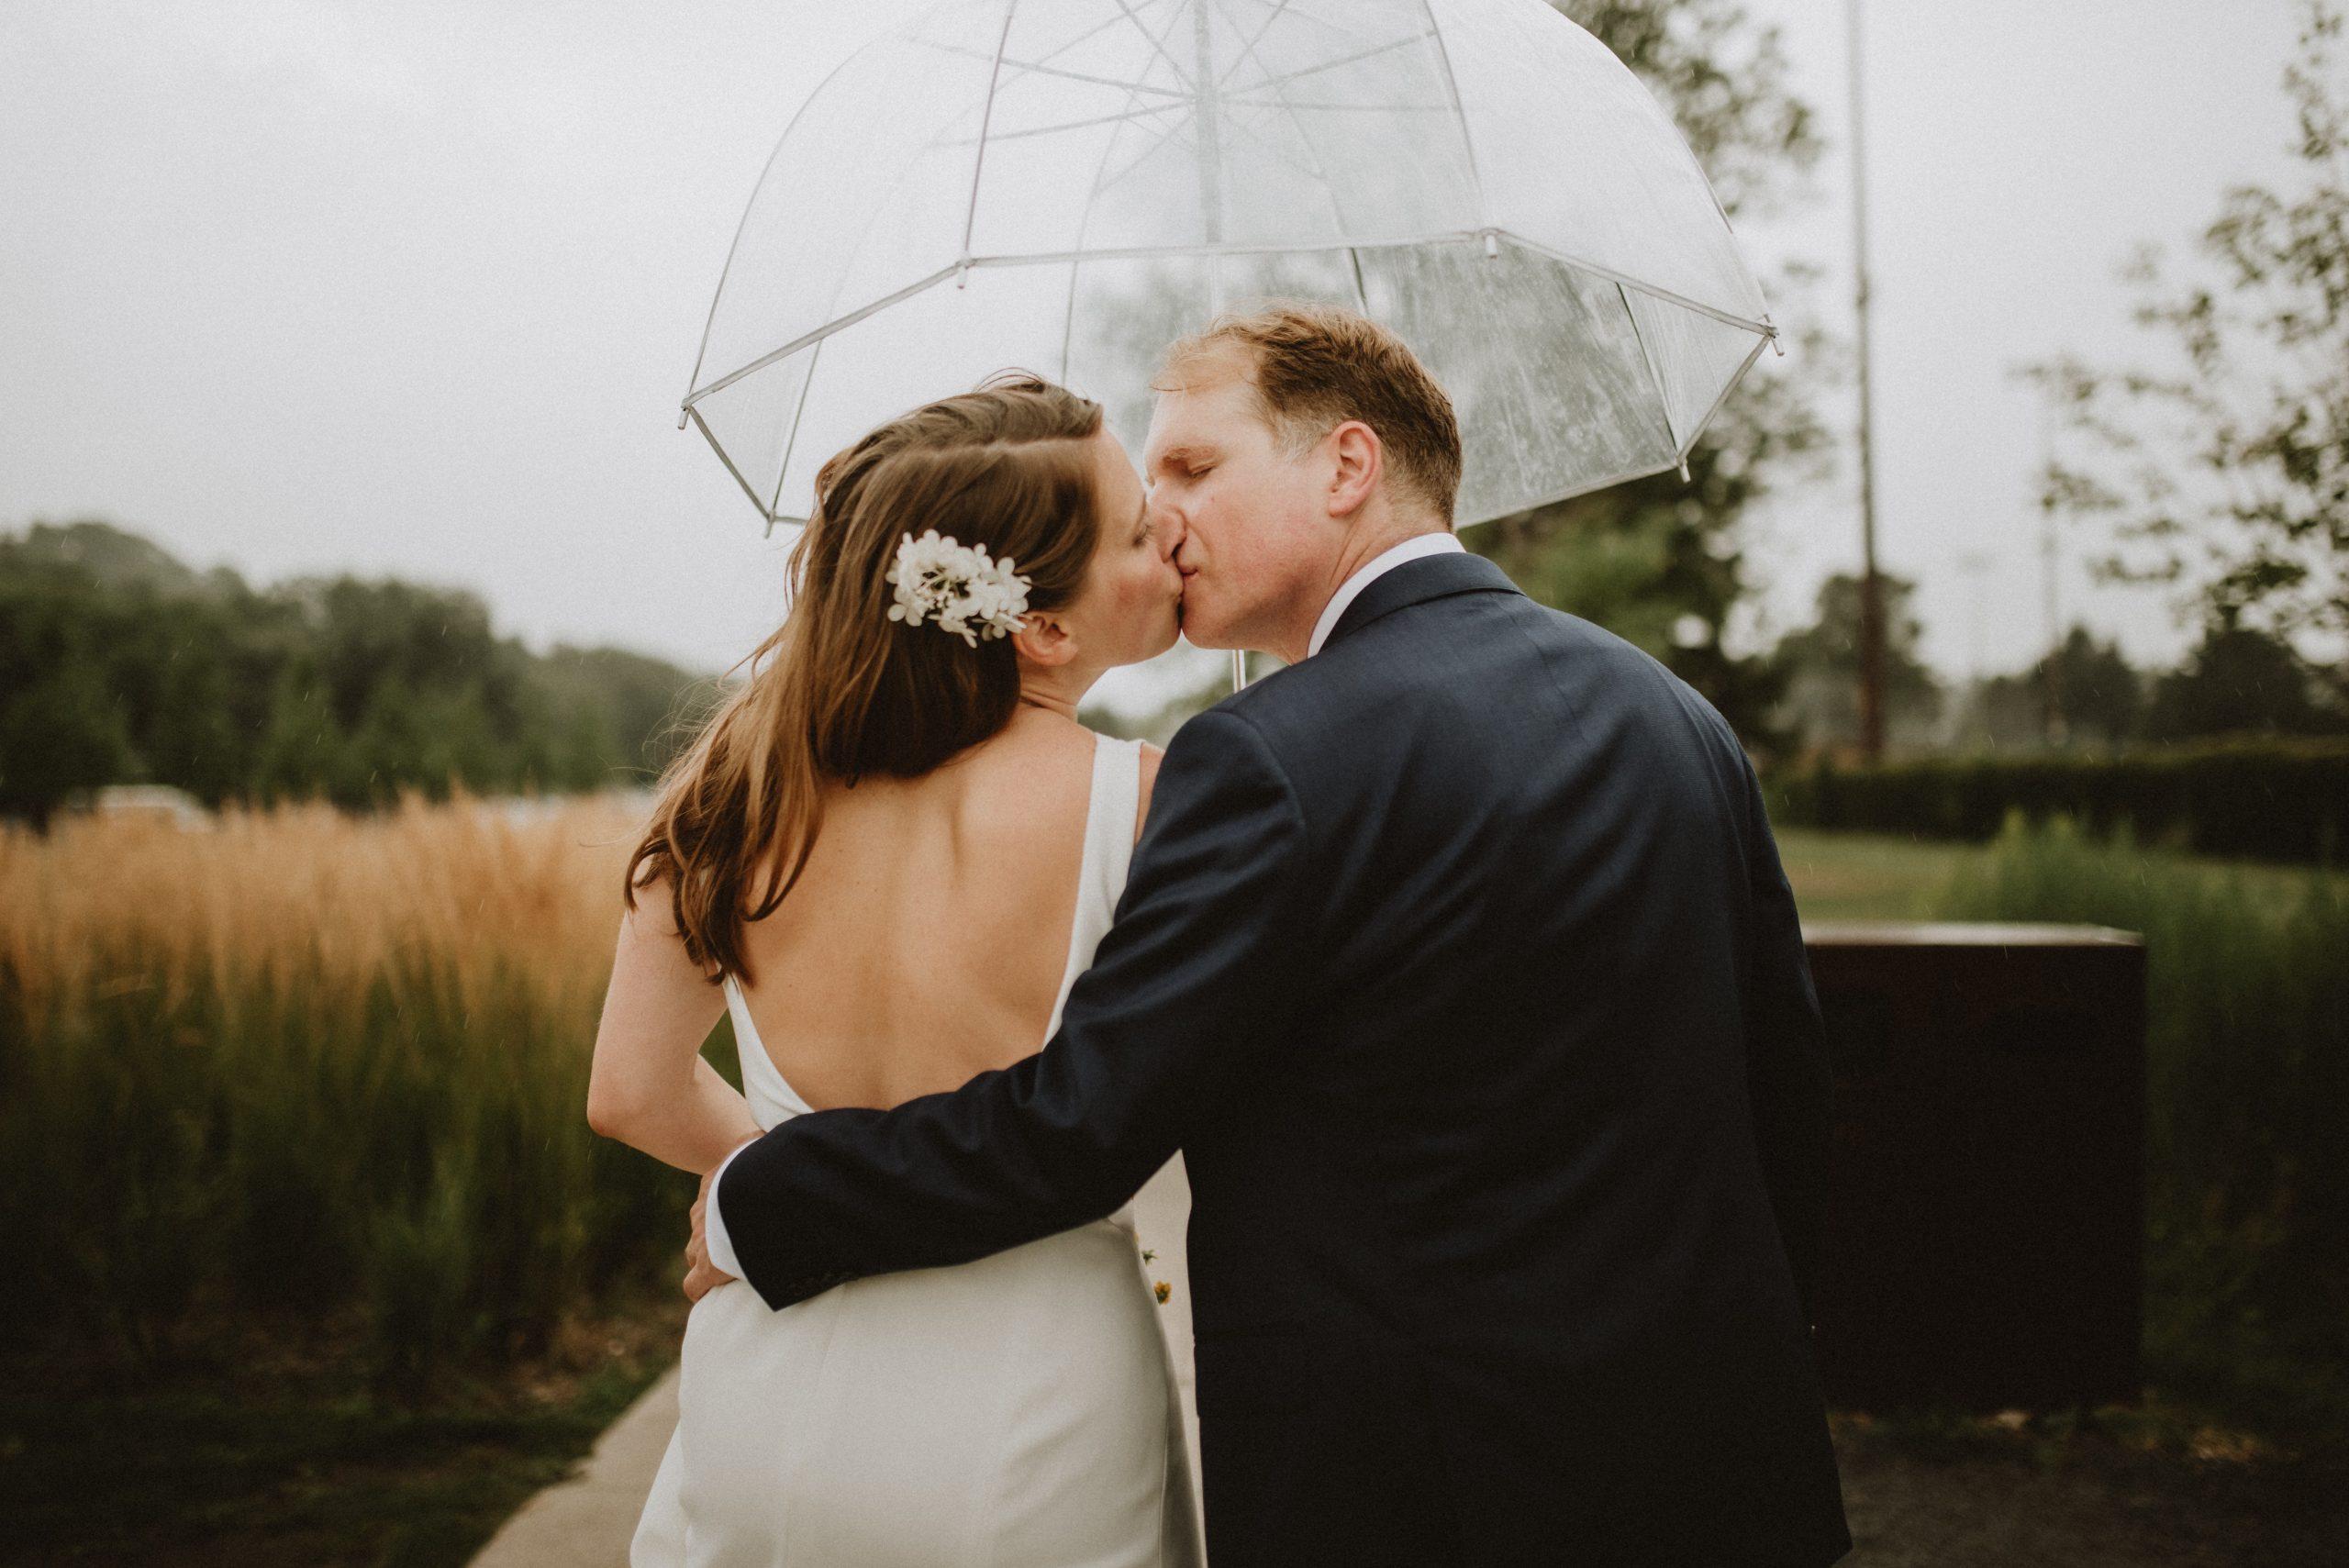 Bride and groom kiss under umbrella in the rain